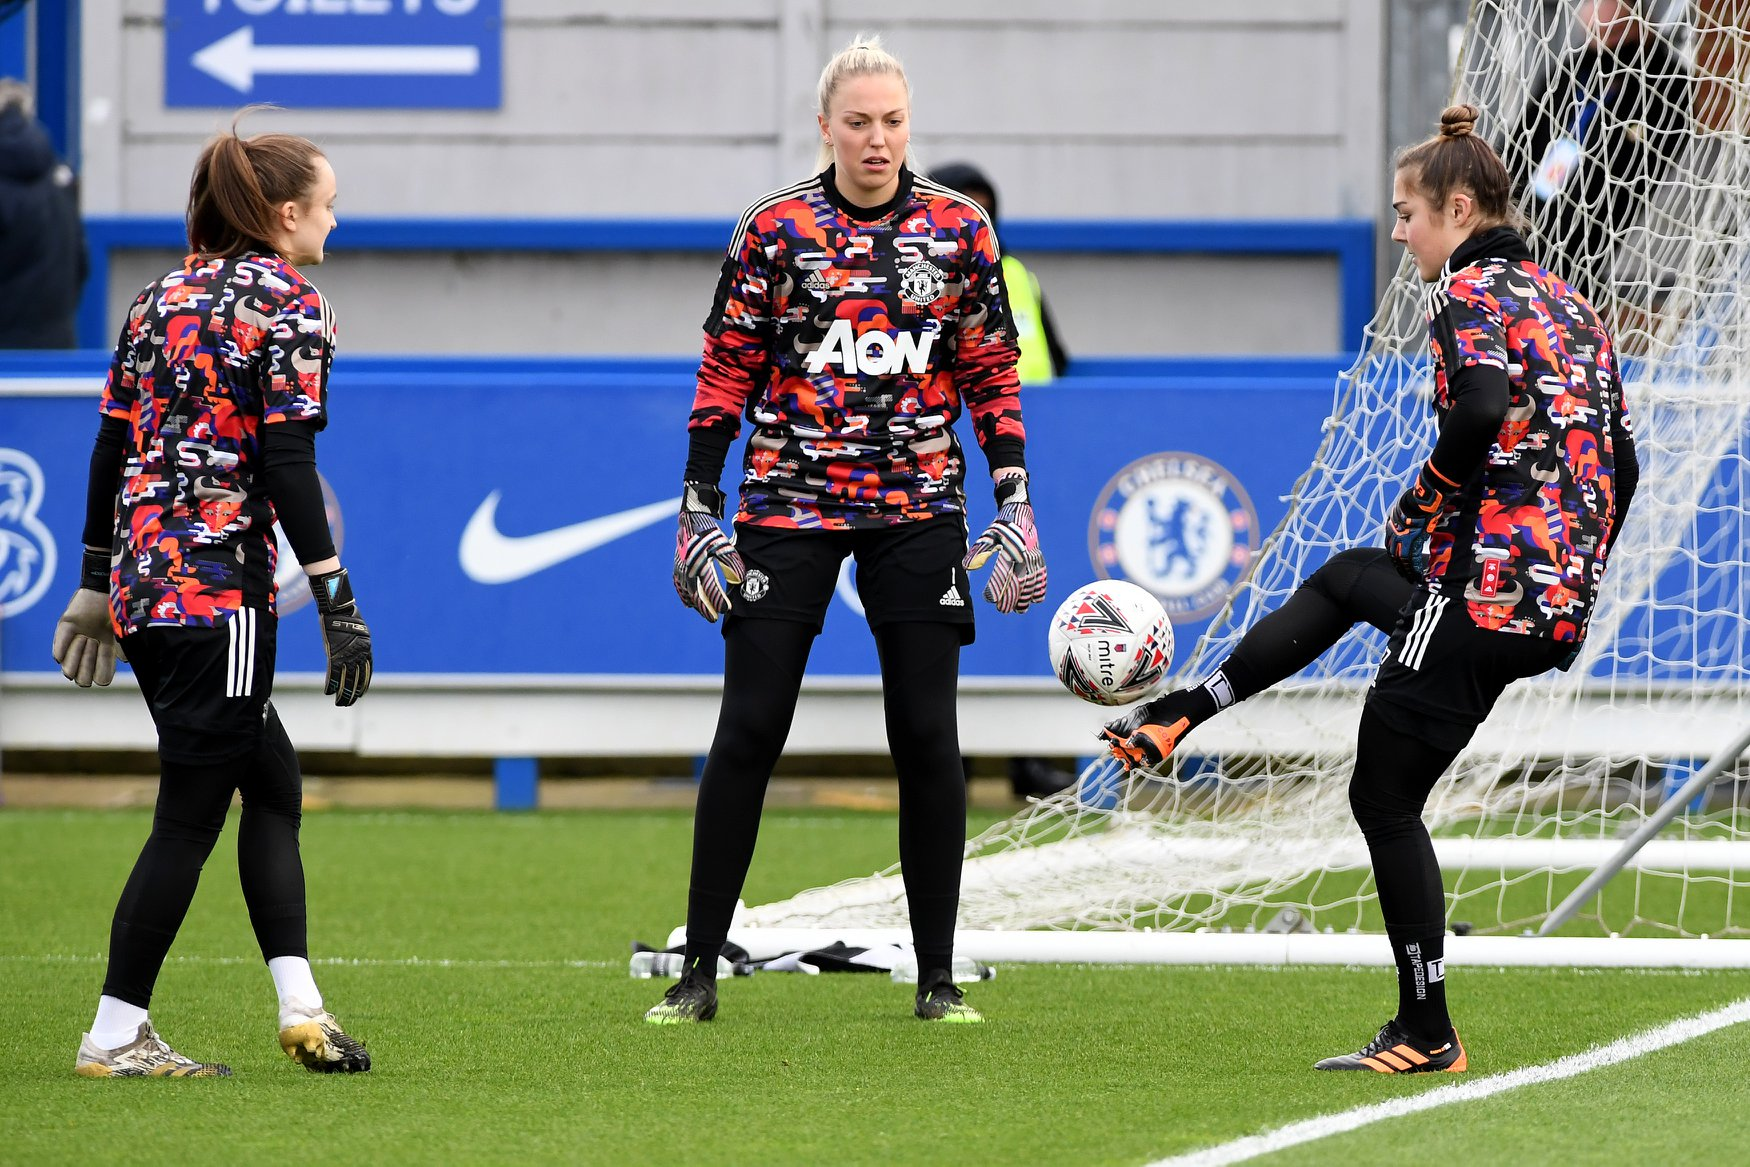 Tŕening Manchester united women